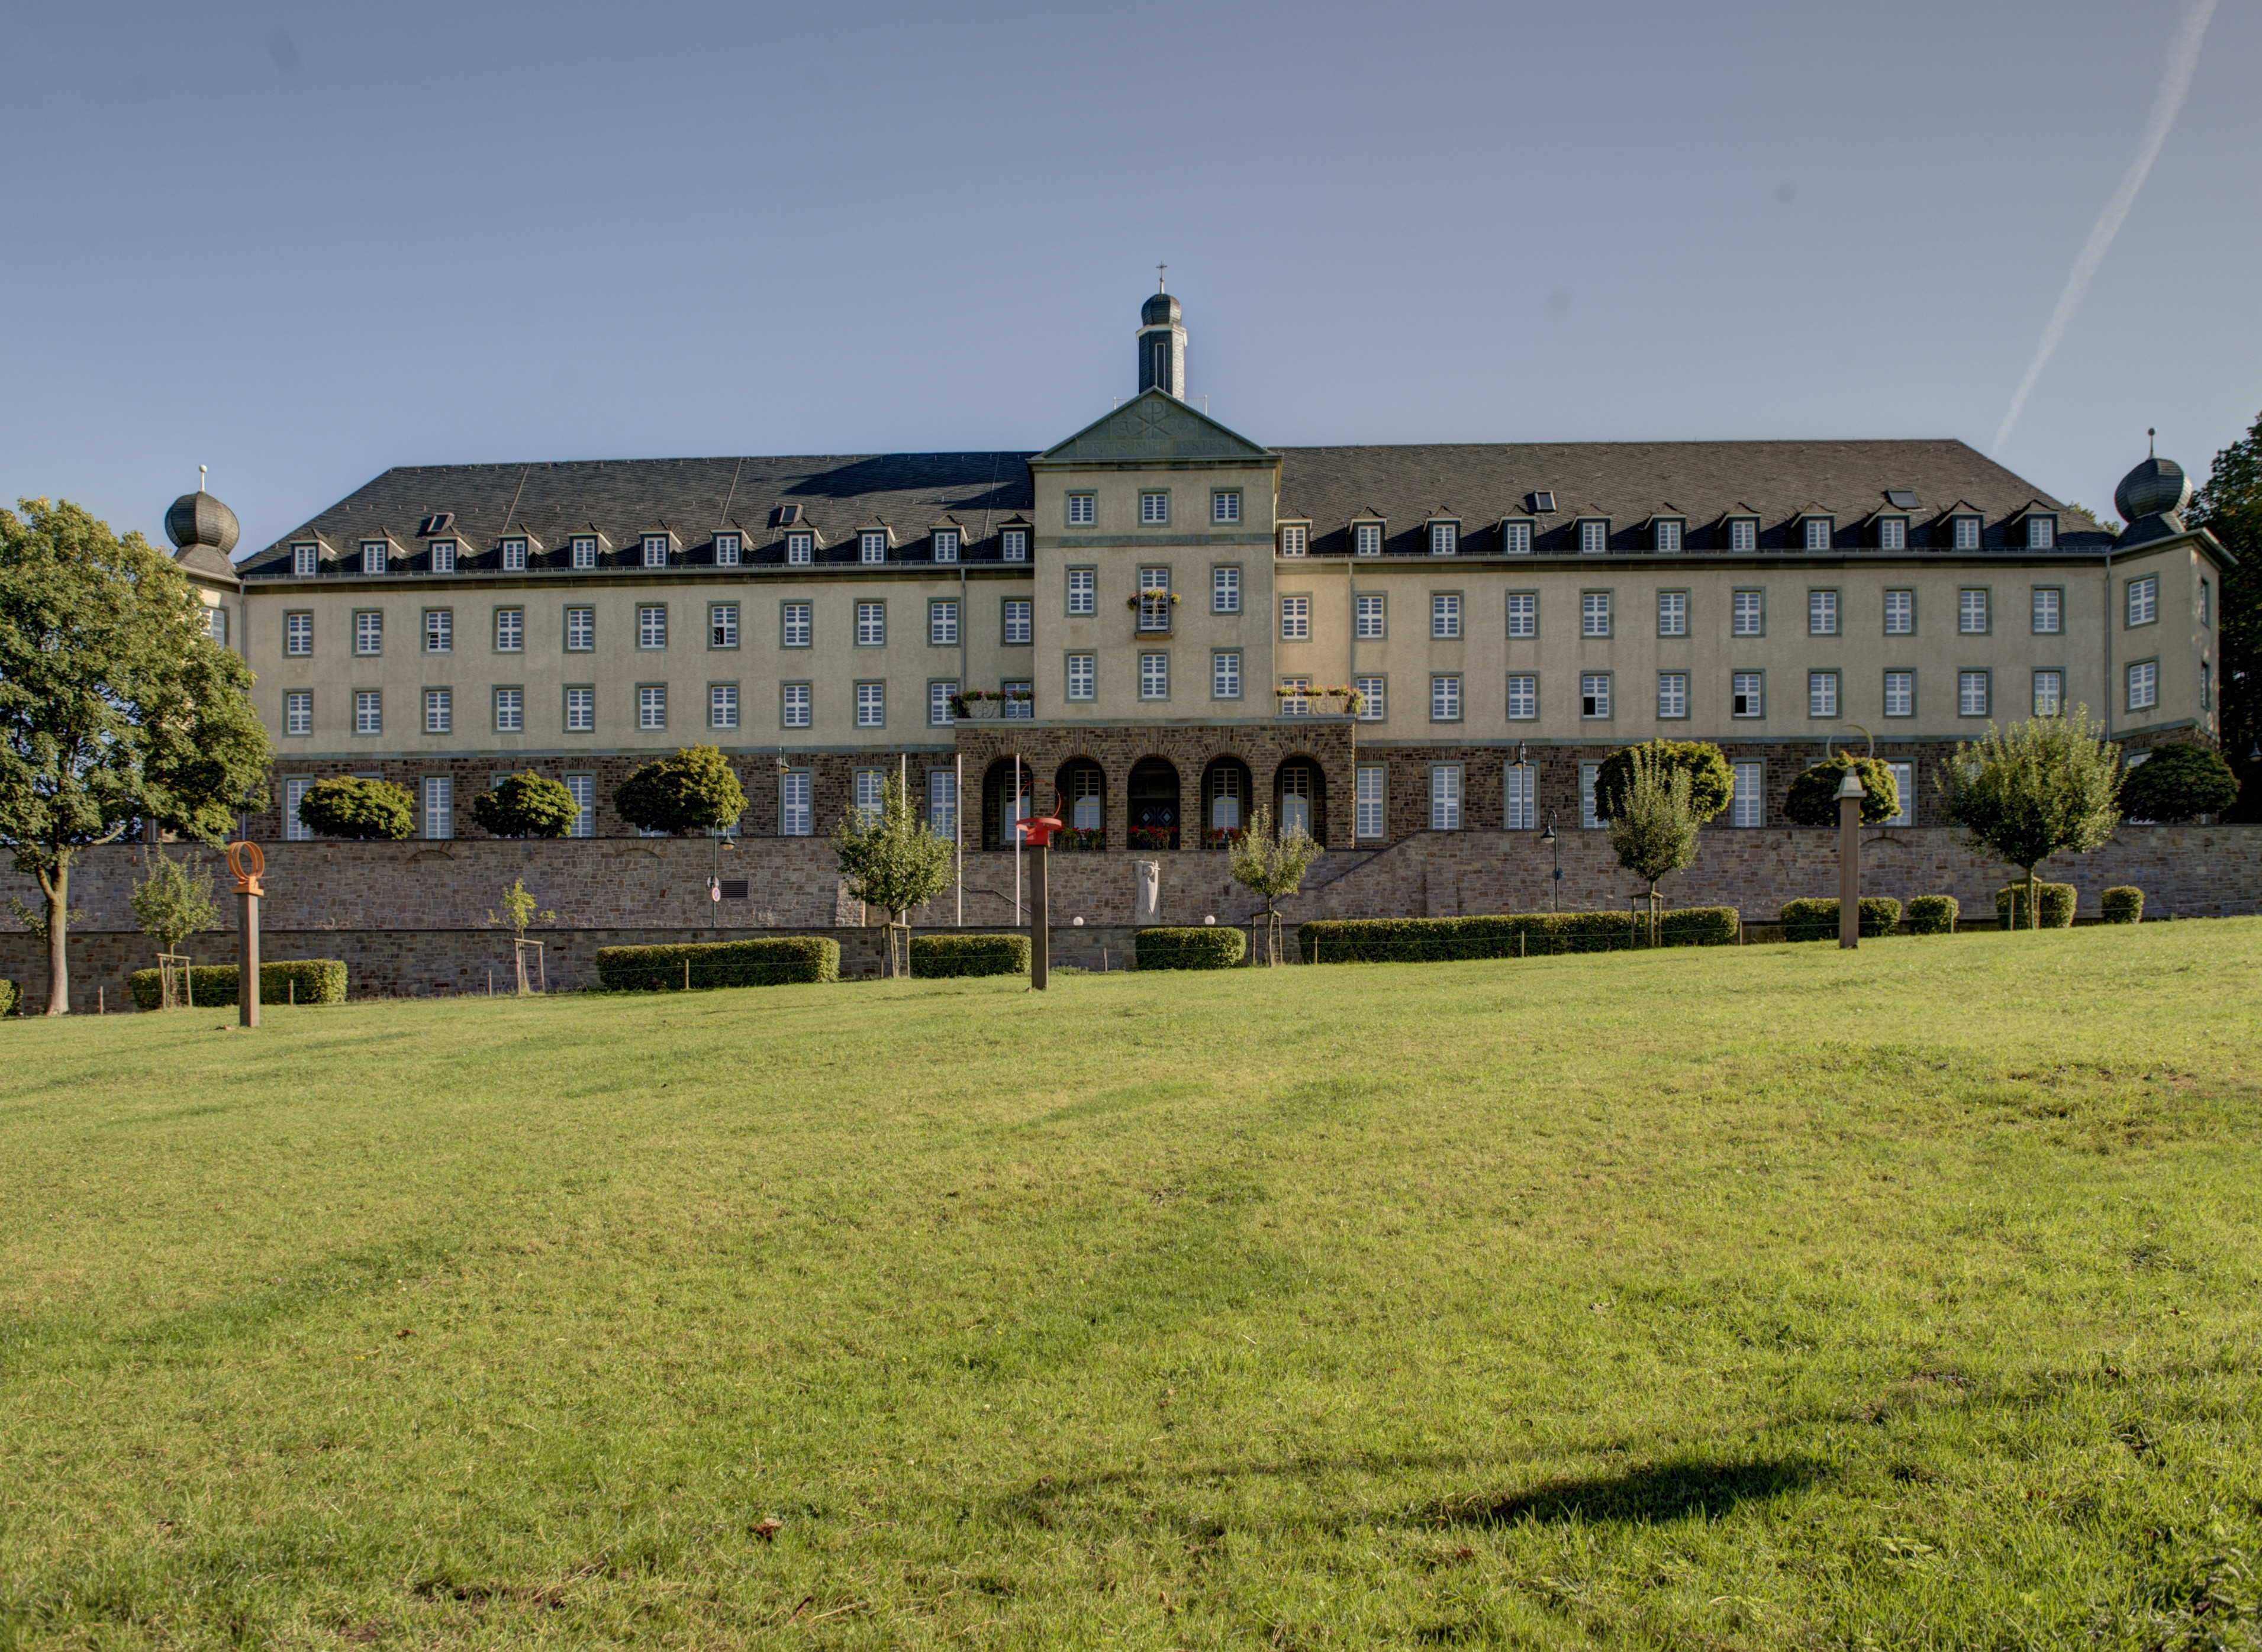 Kardinal Schulte Haus Bensberg  Datei Bensberg Kardinal Schulte Haus Denkmal 71 b ShiftN